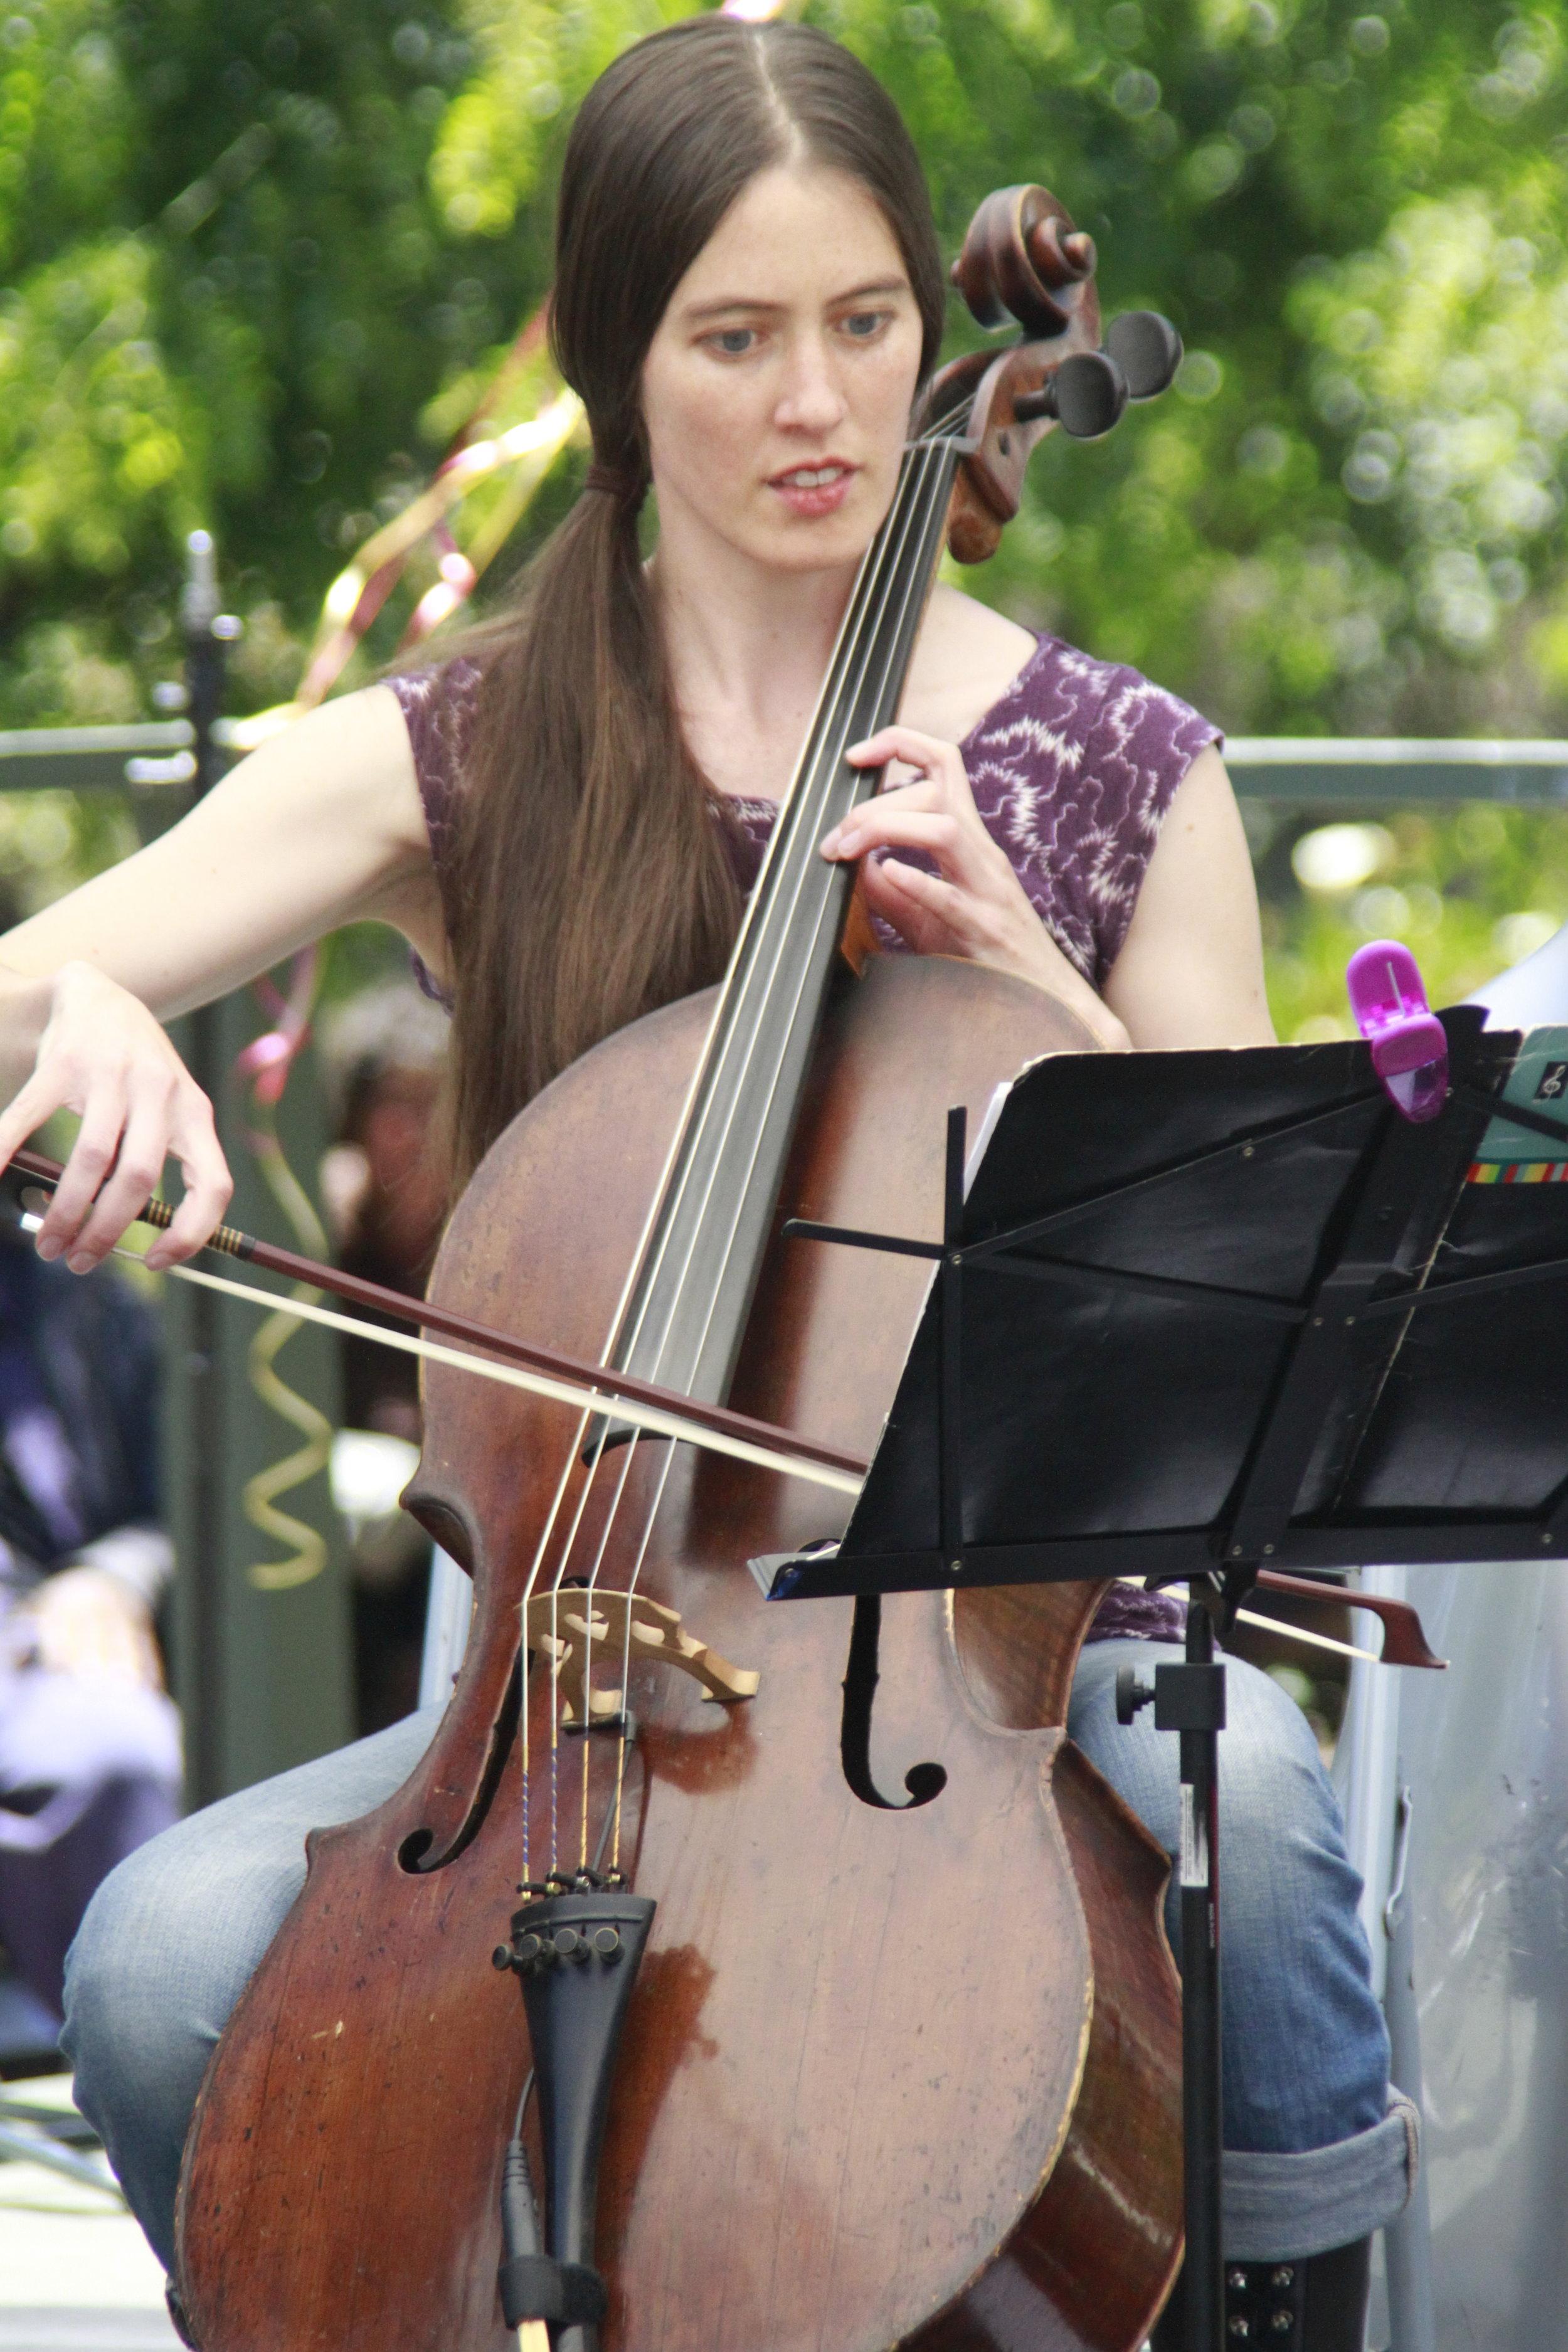 Celloist_MG_2039.JPG